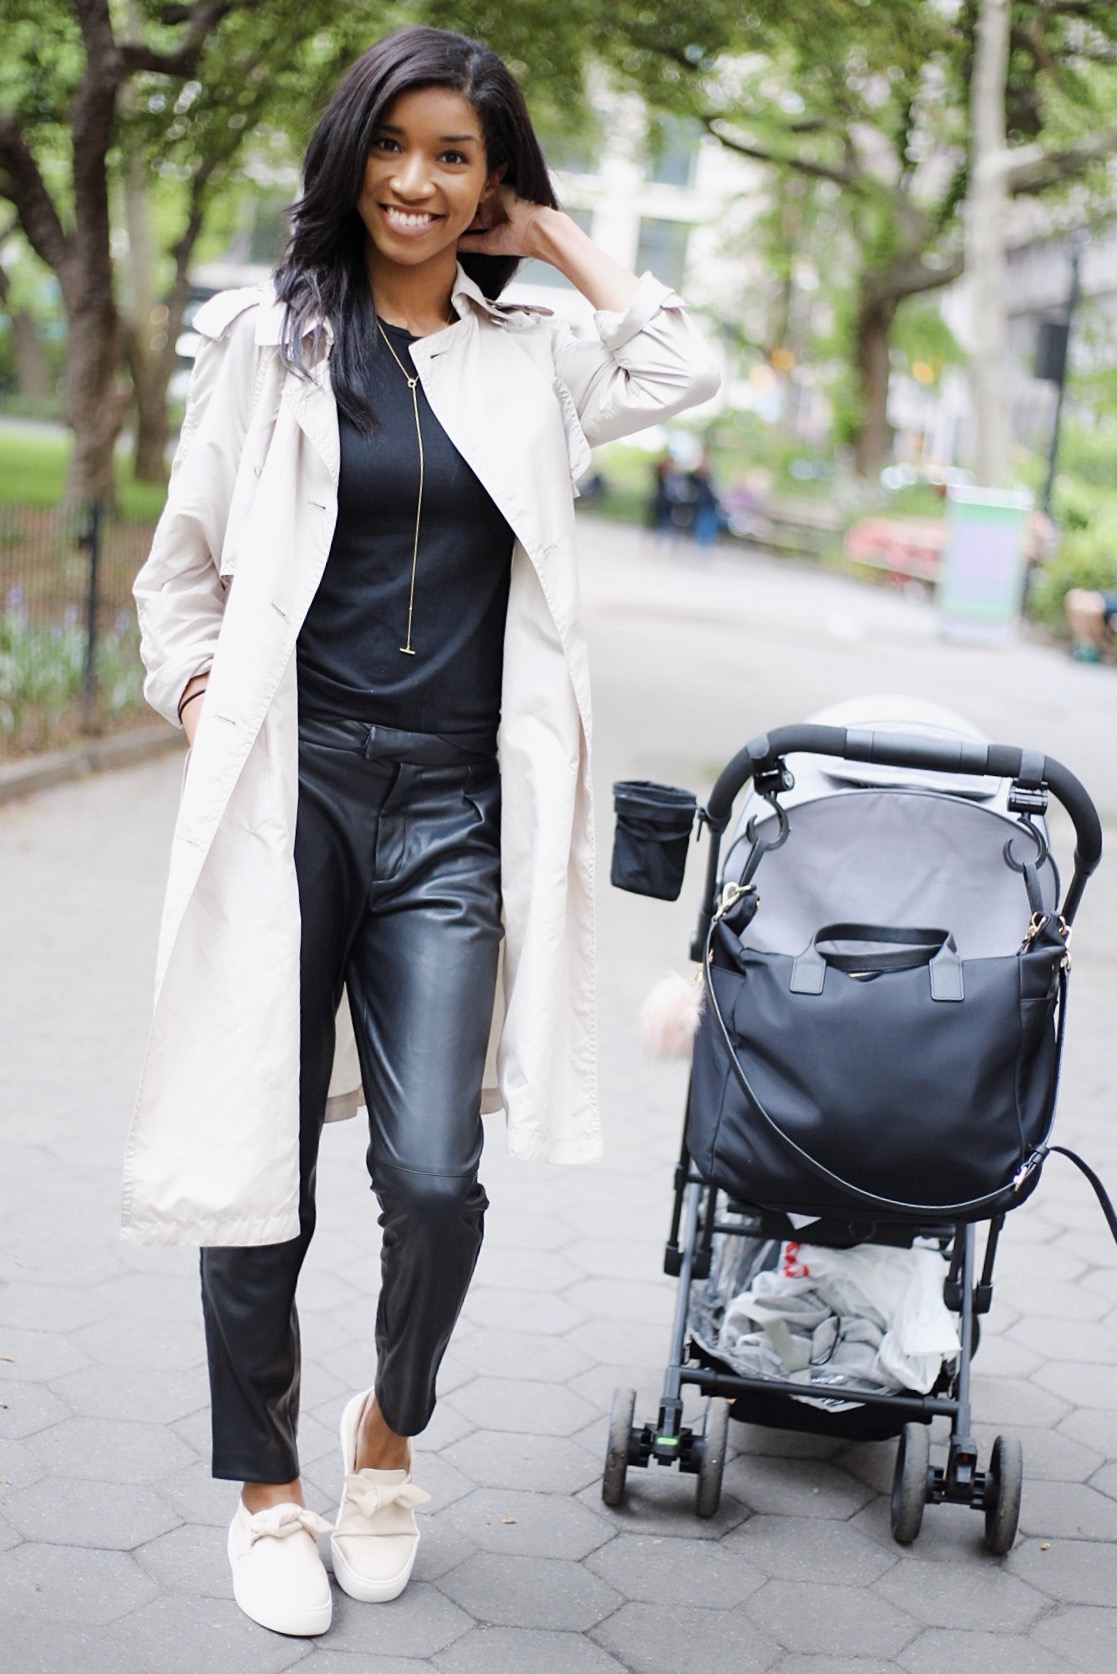 recaro easylife, 14 month milestones, zara baby, baby gap style, baby milestones, baby outfits, baby update, mom life baby update